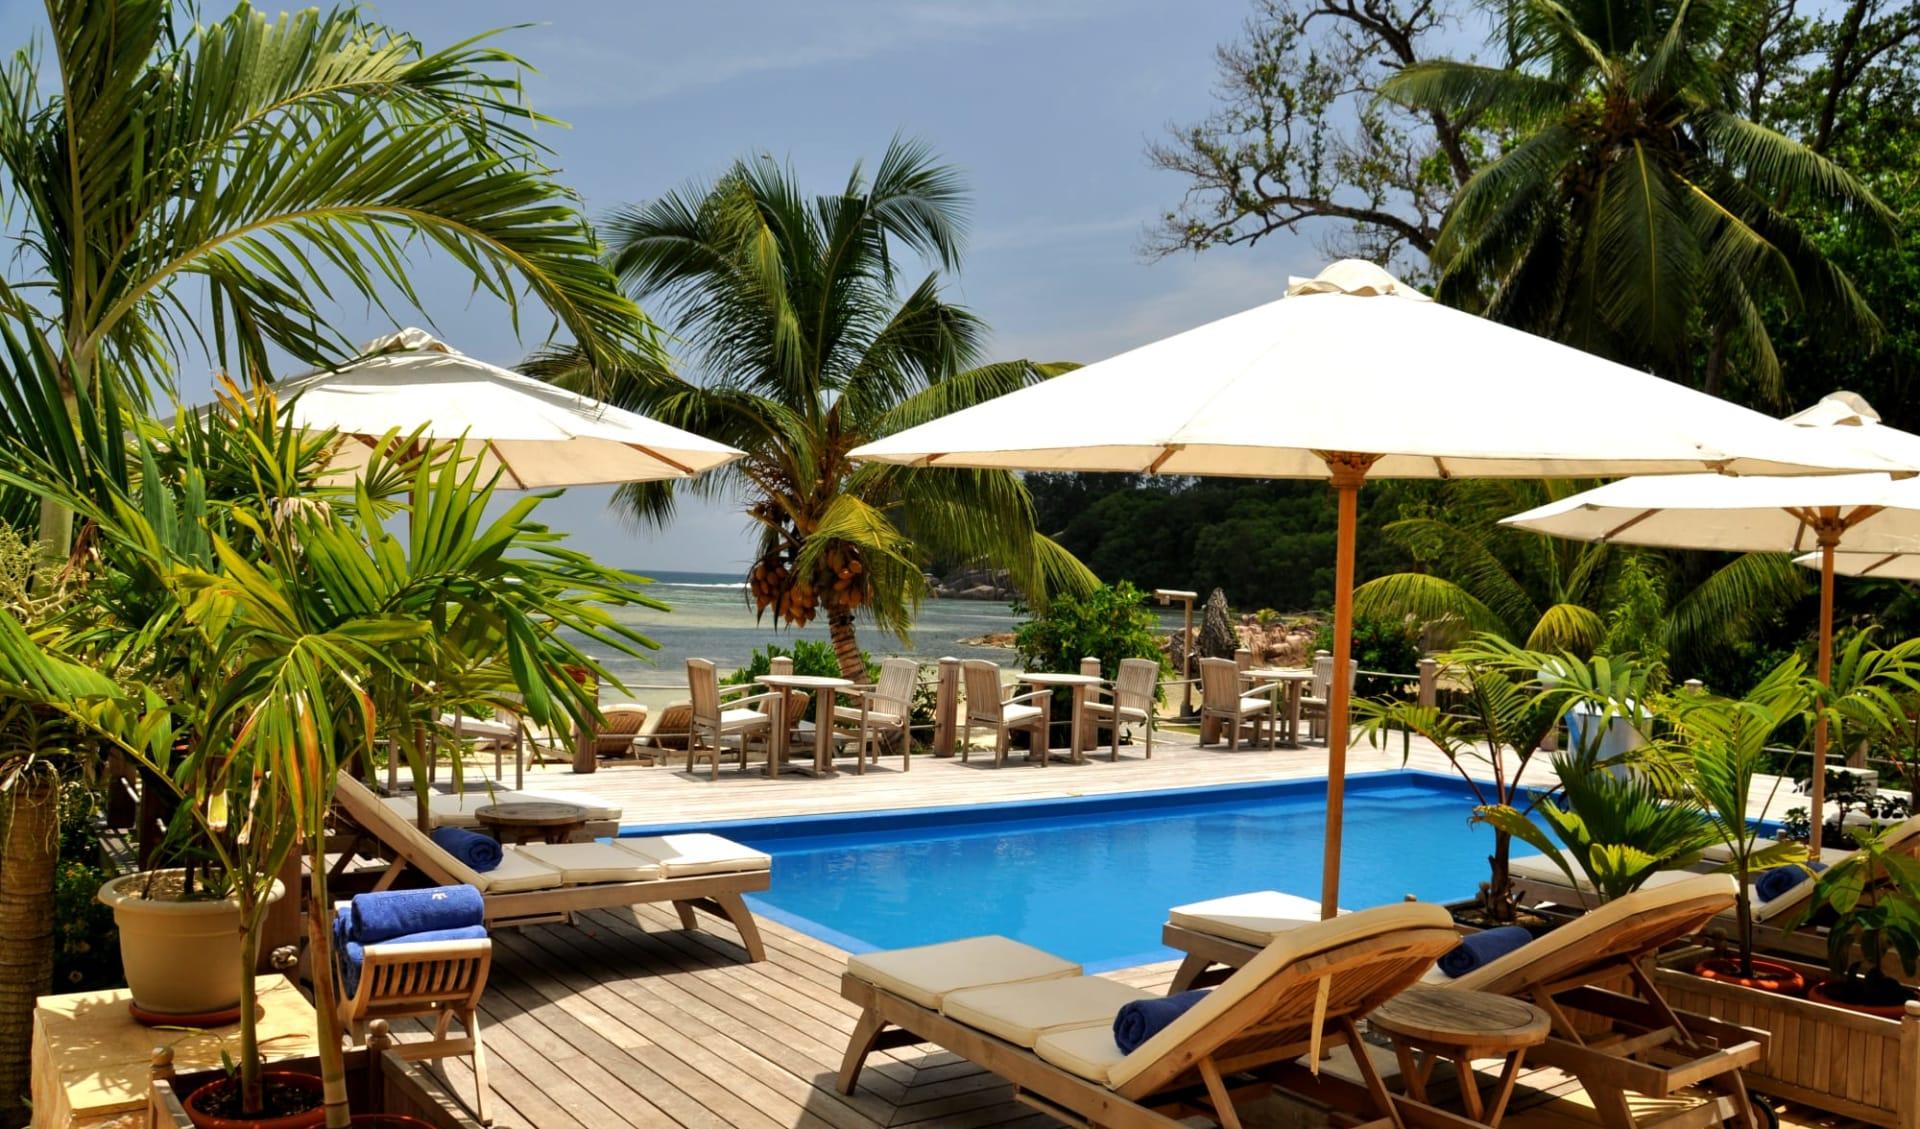 Crown Beach Hotel in Mahé: